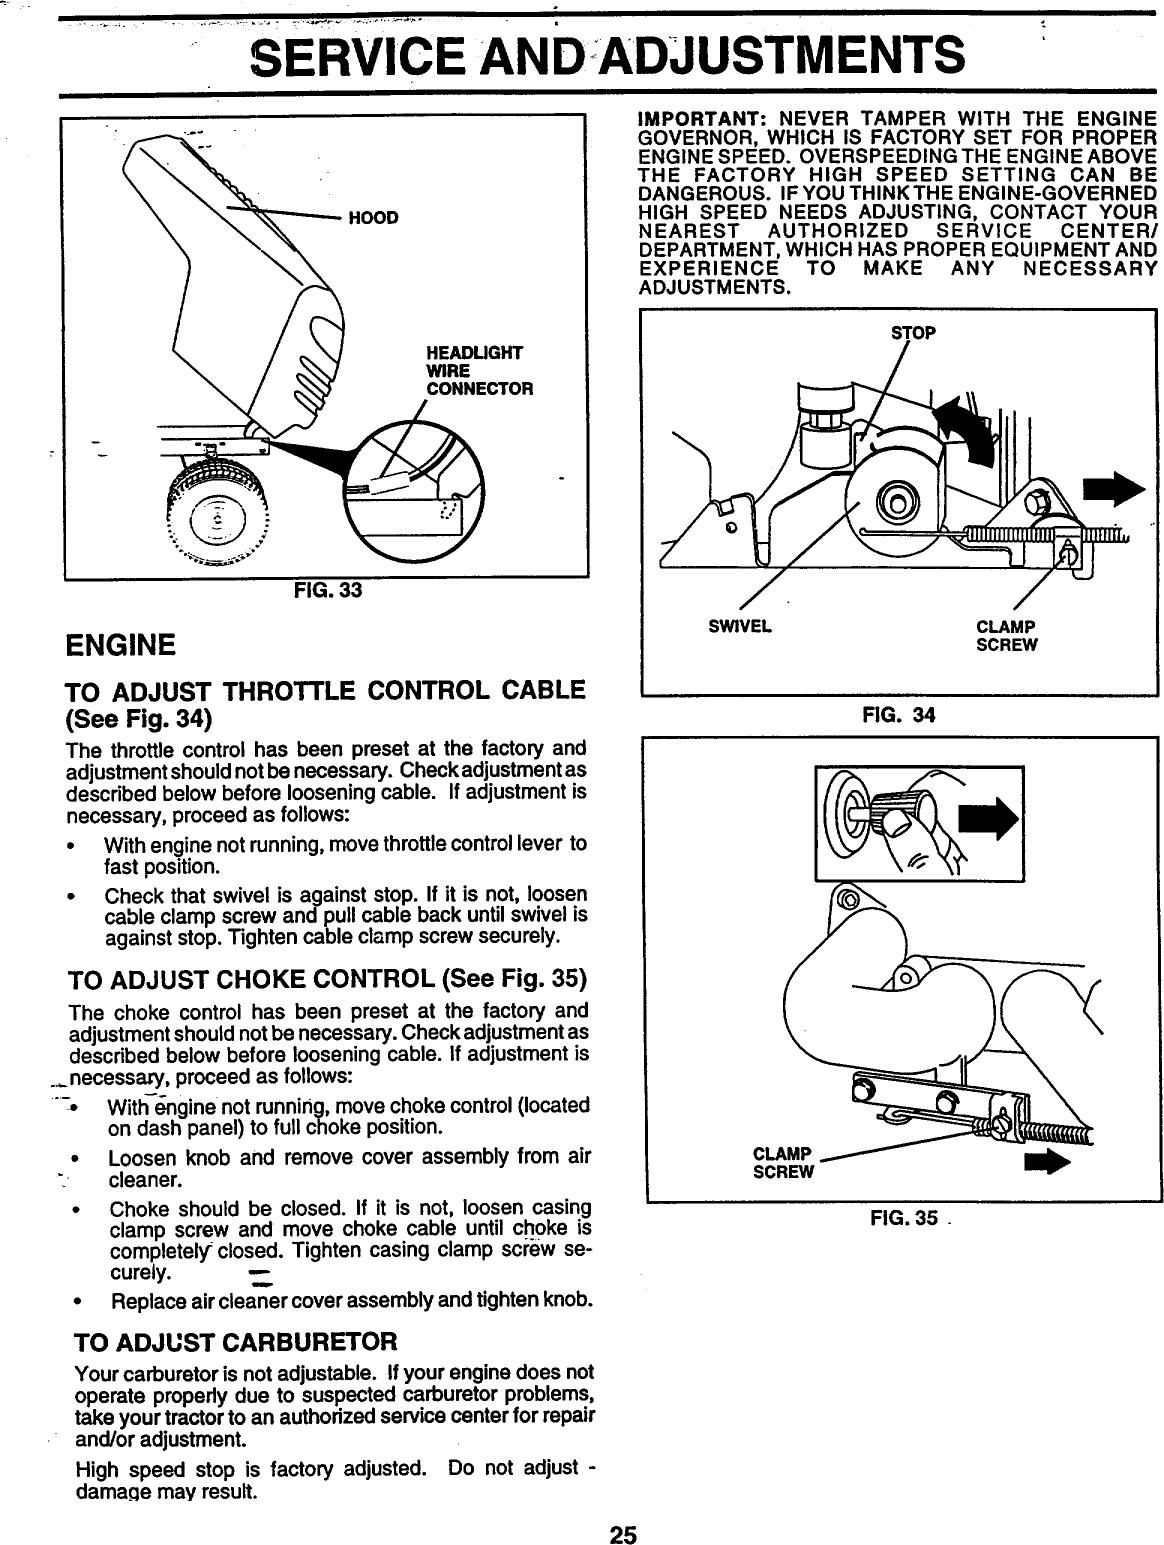 Western Auto AYP9187B89 User Manual WIZARD LAWN TRACTOR